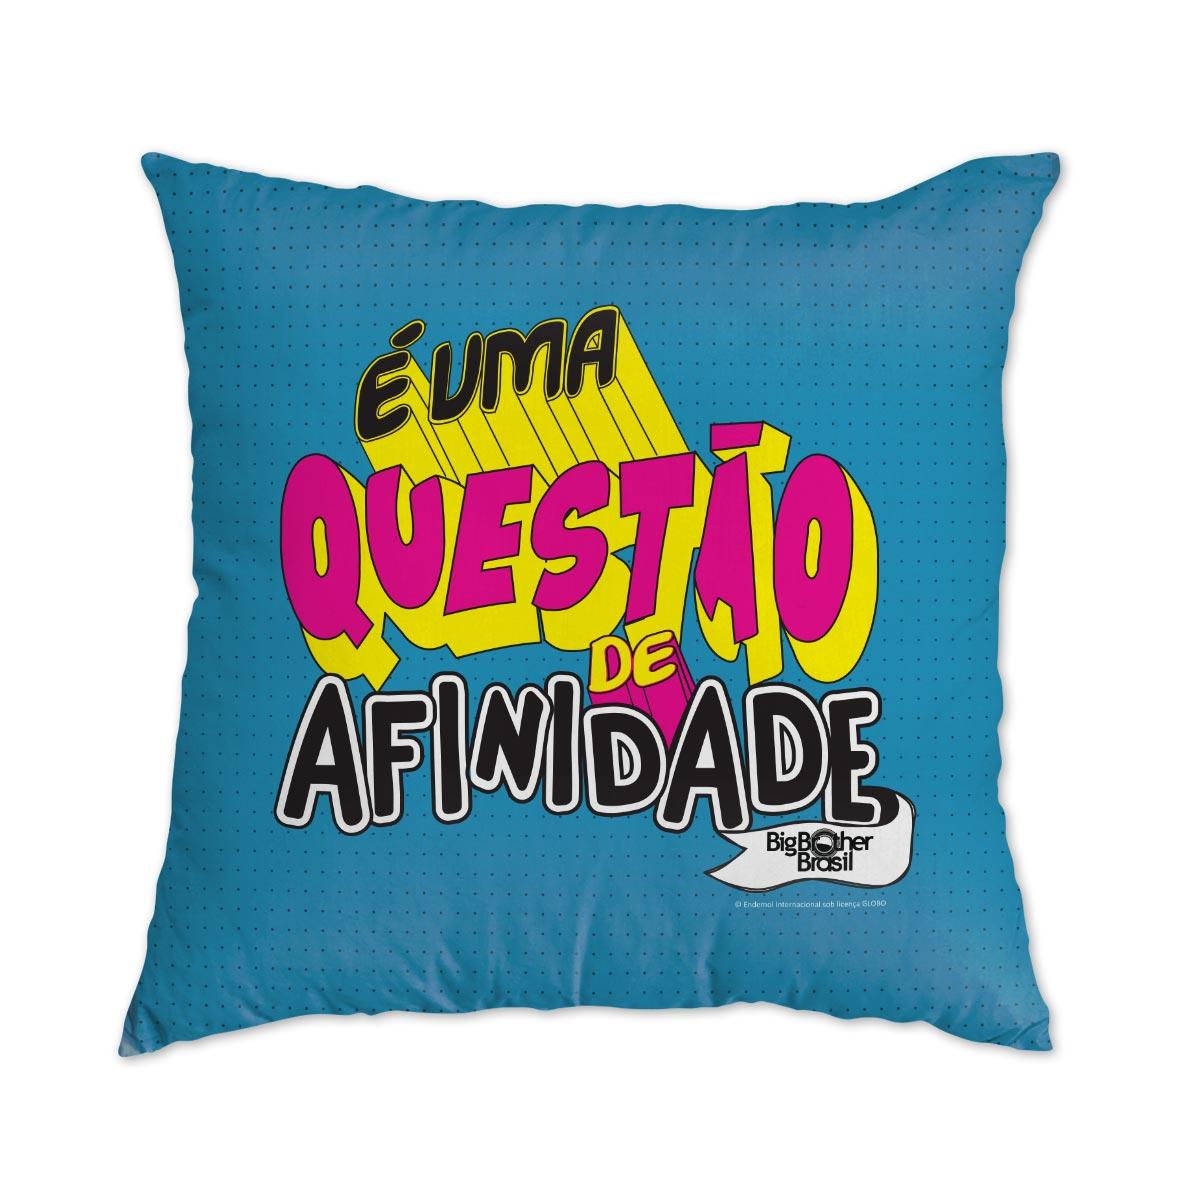 Almofada Big Brother Brasil 15 Afinidade